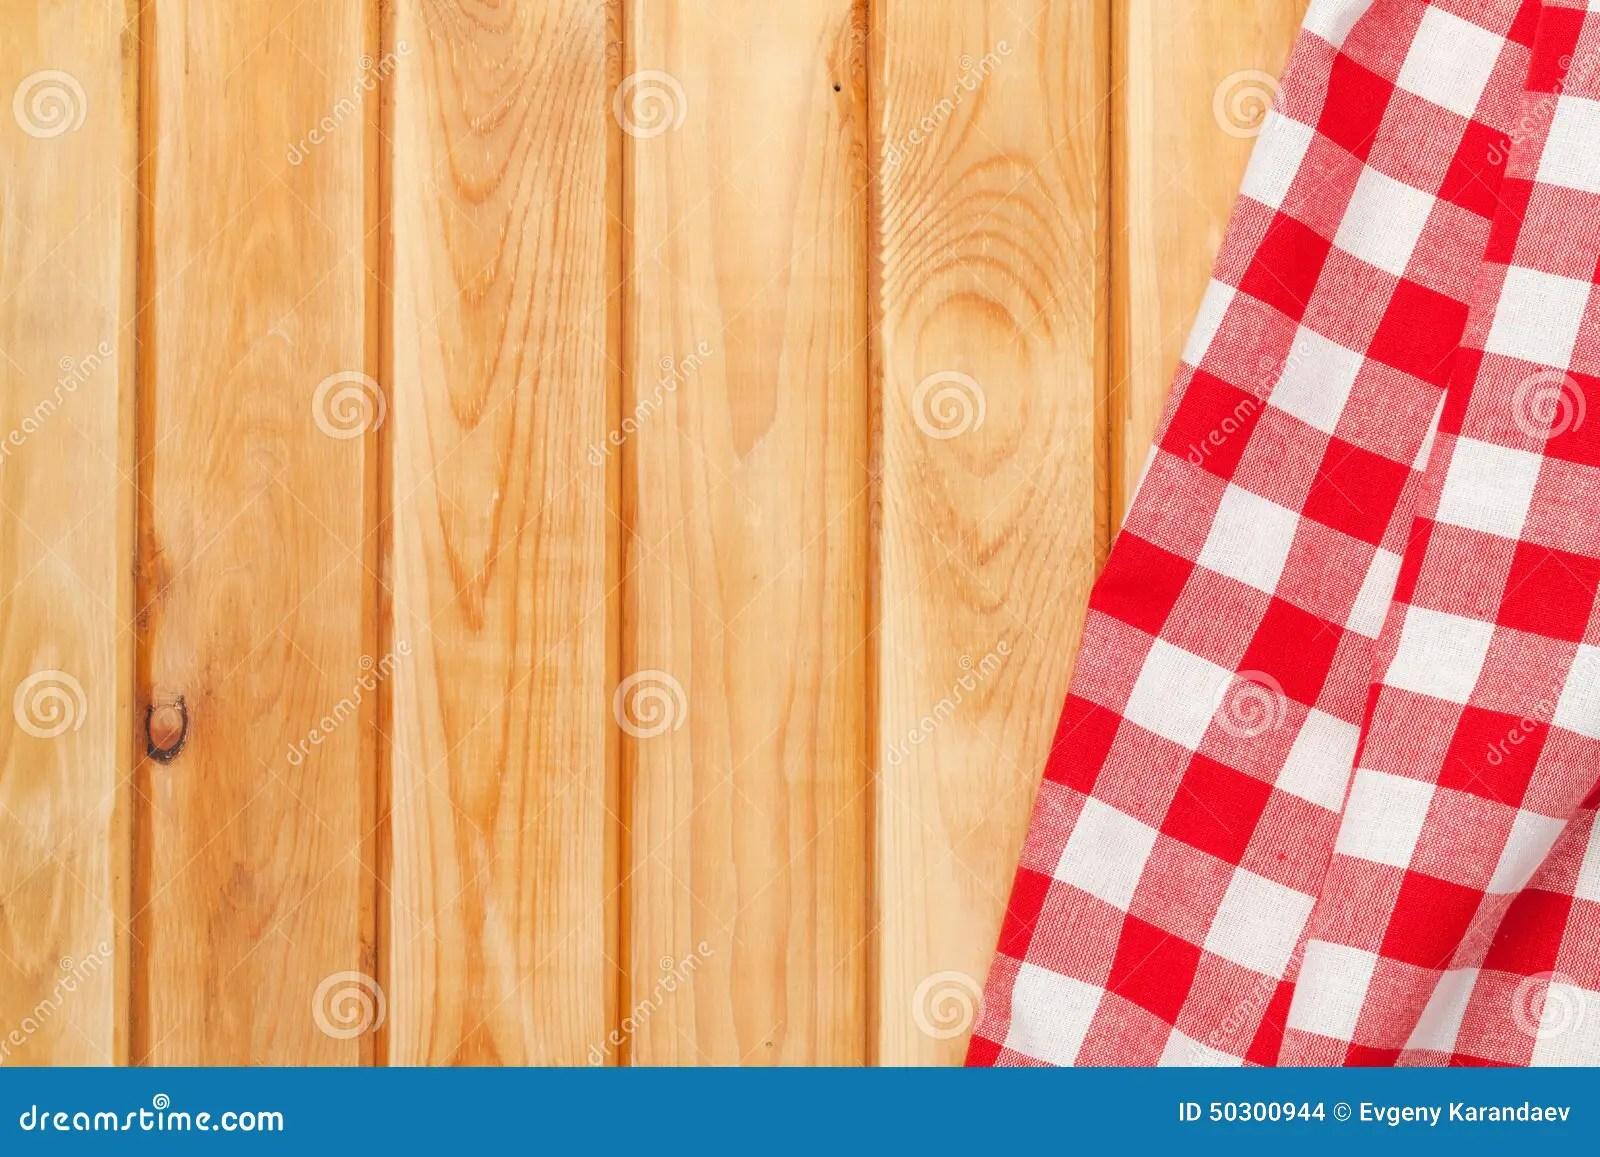 towel for kitchen pendant lighting 在木厨房用桌的红色毛巾库存照片 图片包括有没人 模式 干净 检查 在木厨房用桌的红色毛巾